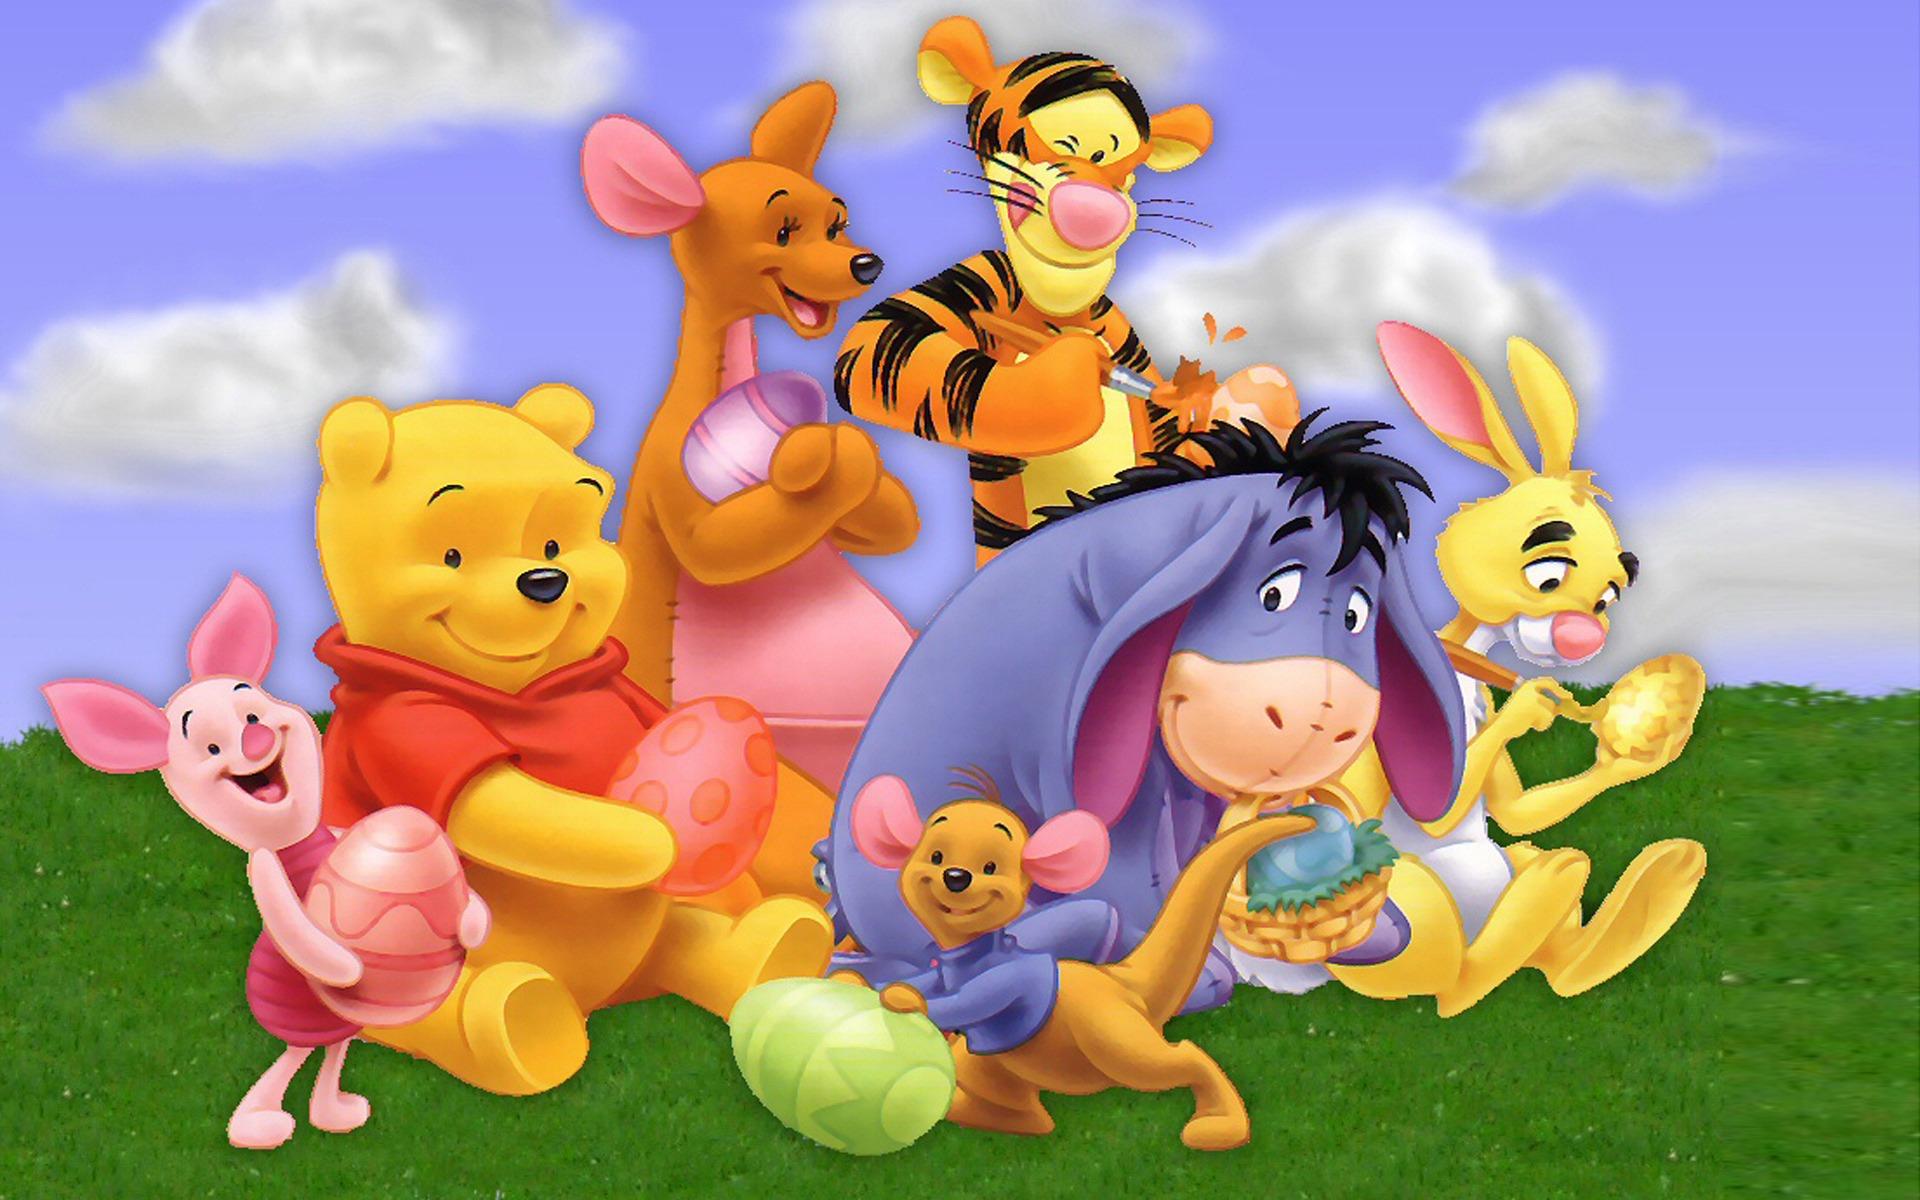 Winnie the pooh cartoon character hd desktop wallpaper - Cartoon character wallpaper ...